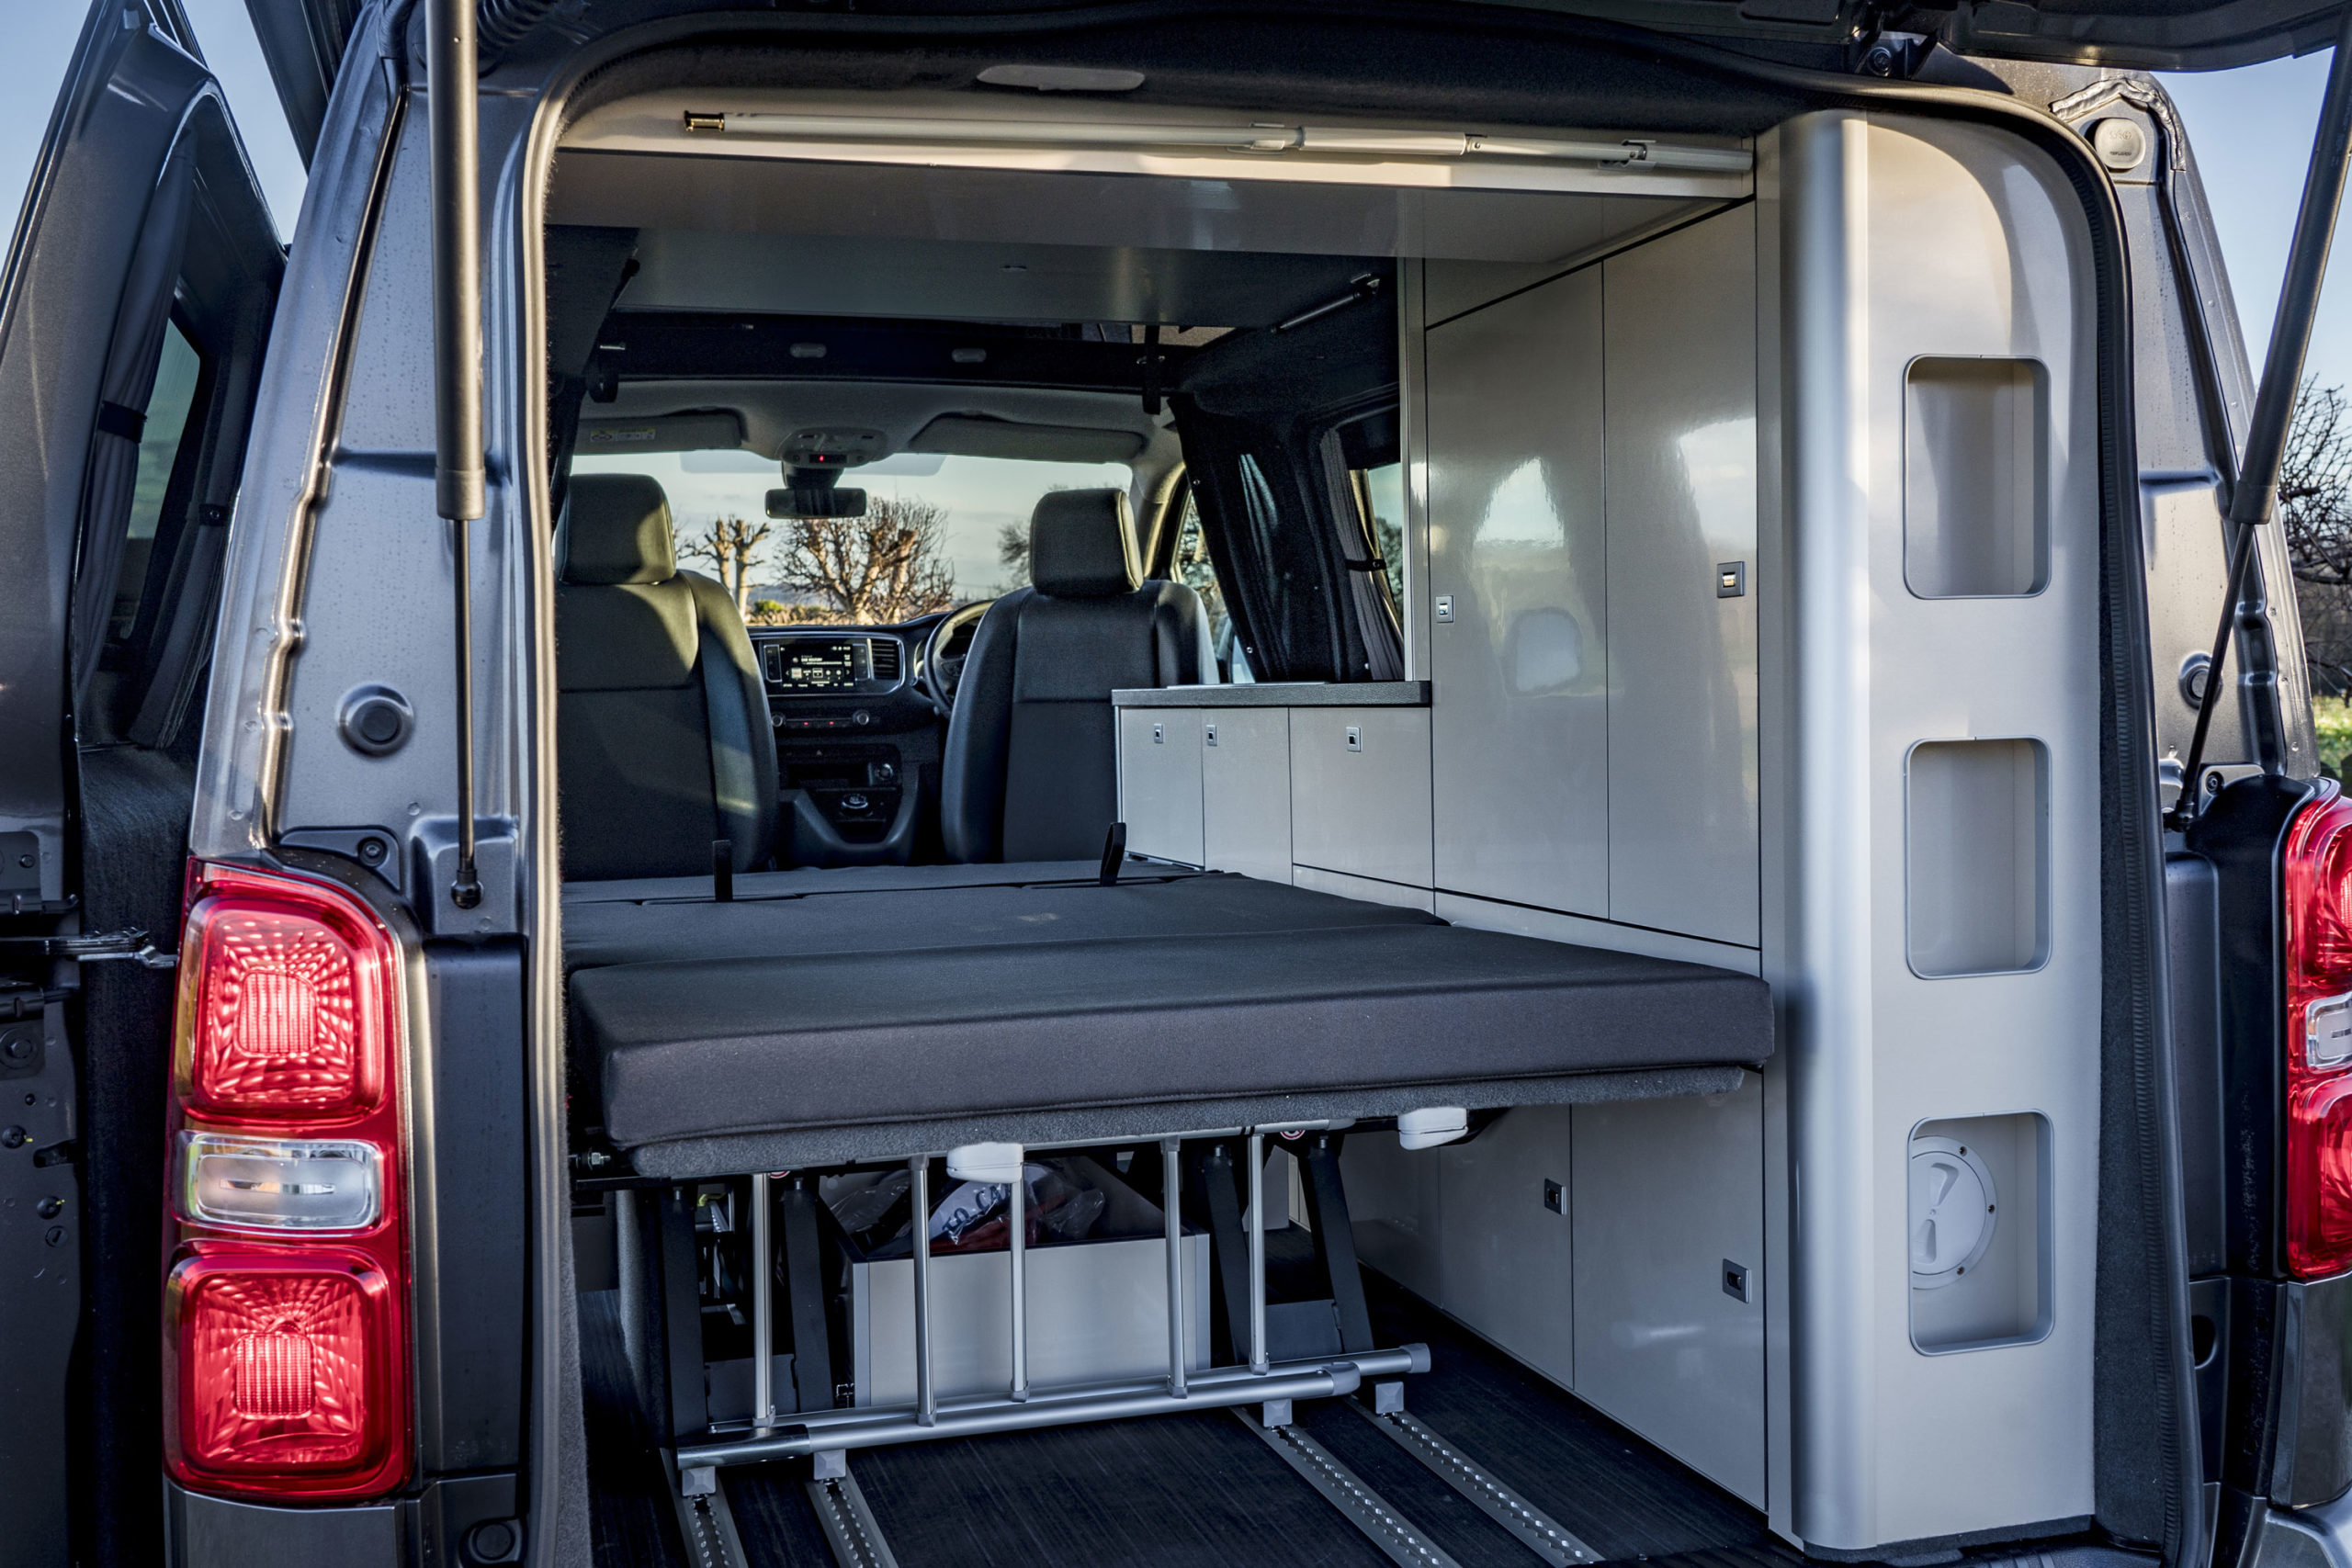 Vauxhall Vivaro Elite Campervan Folding Bed